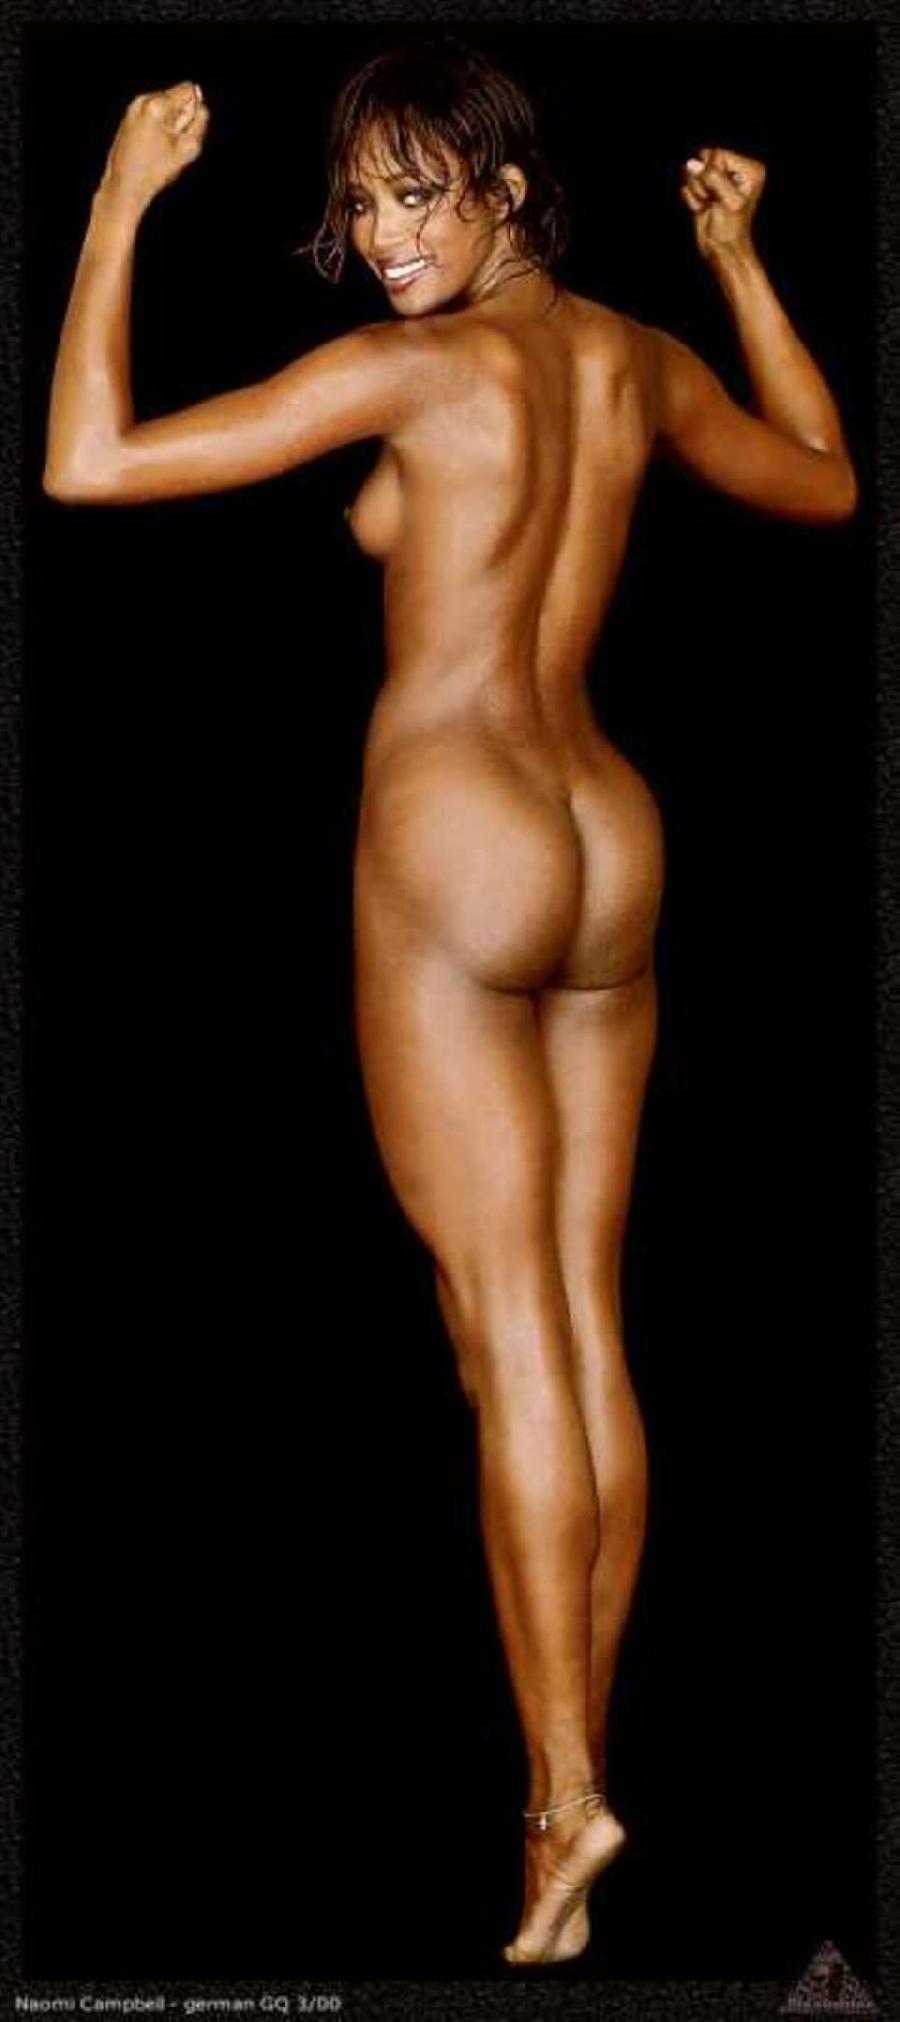 Модель наоми кэмпбелл фото порно